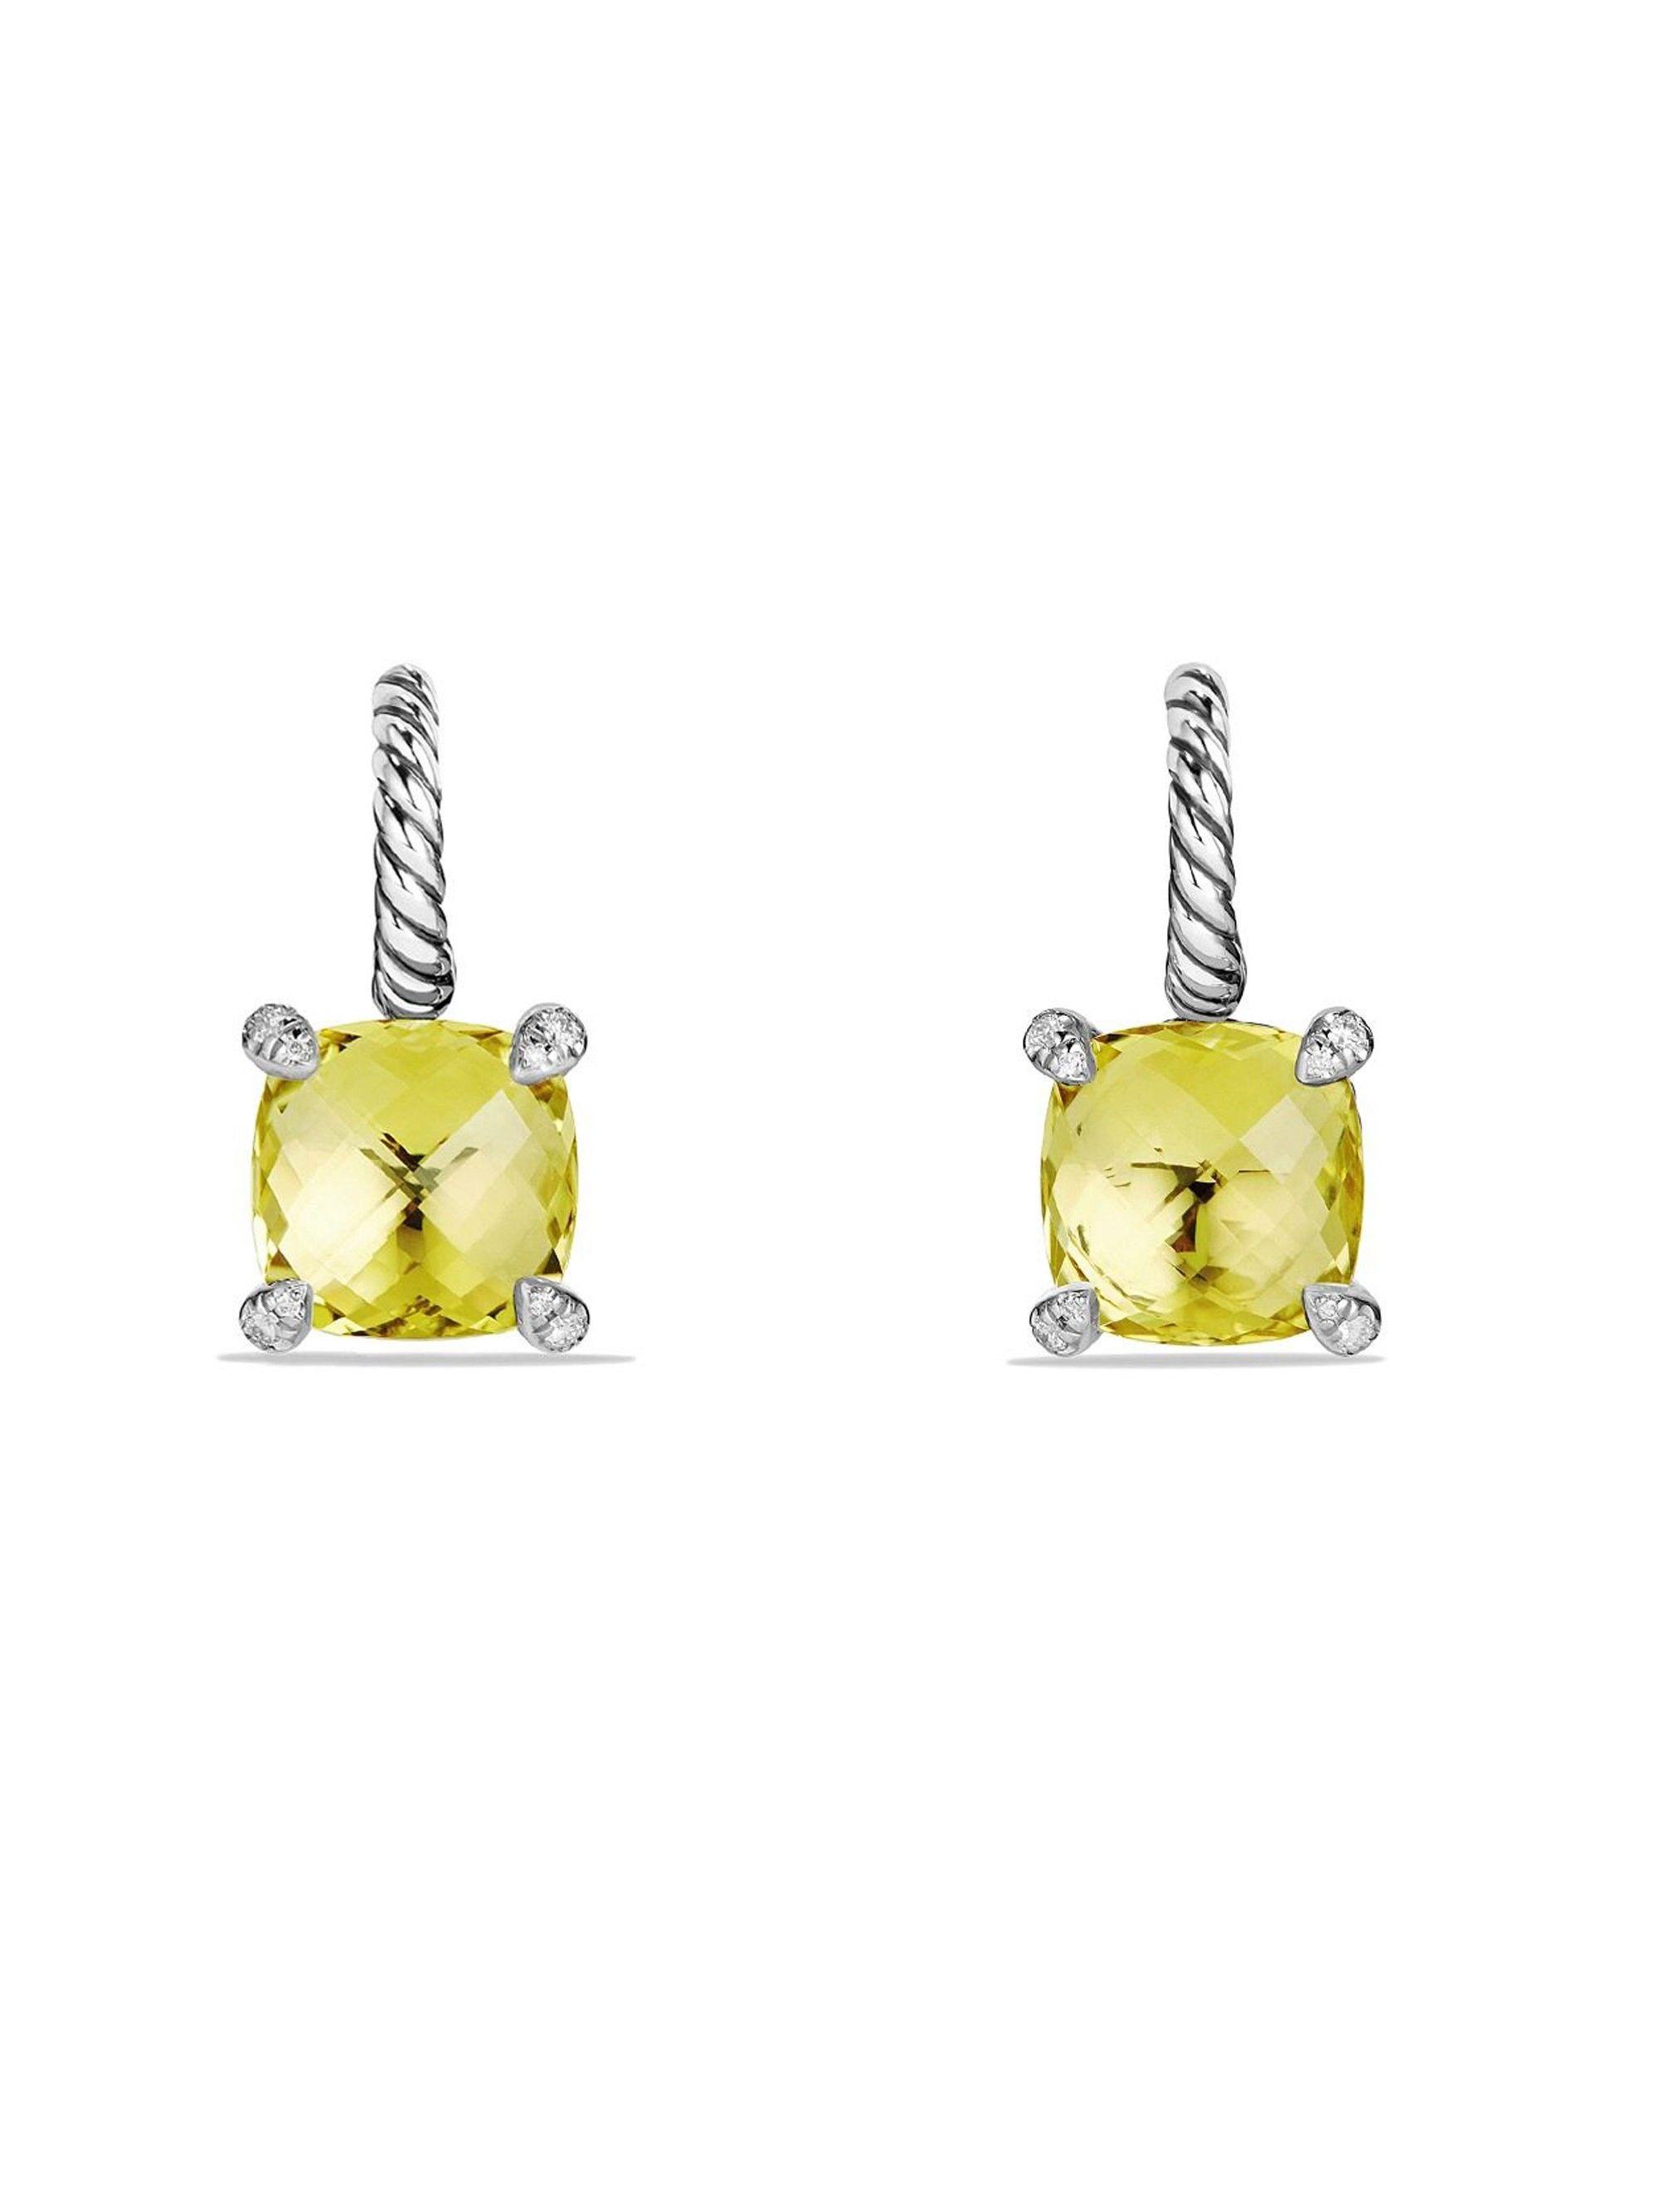 Ch¢telaine Drop Earrings with Gemstone and Diamonds by David Yurman